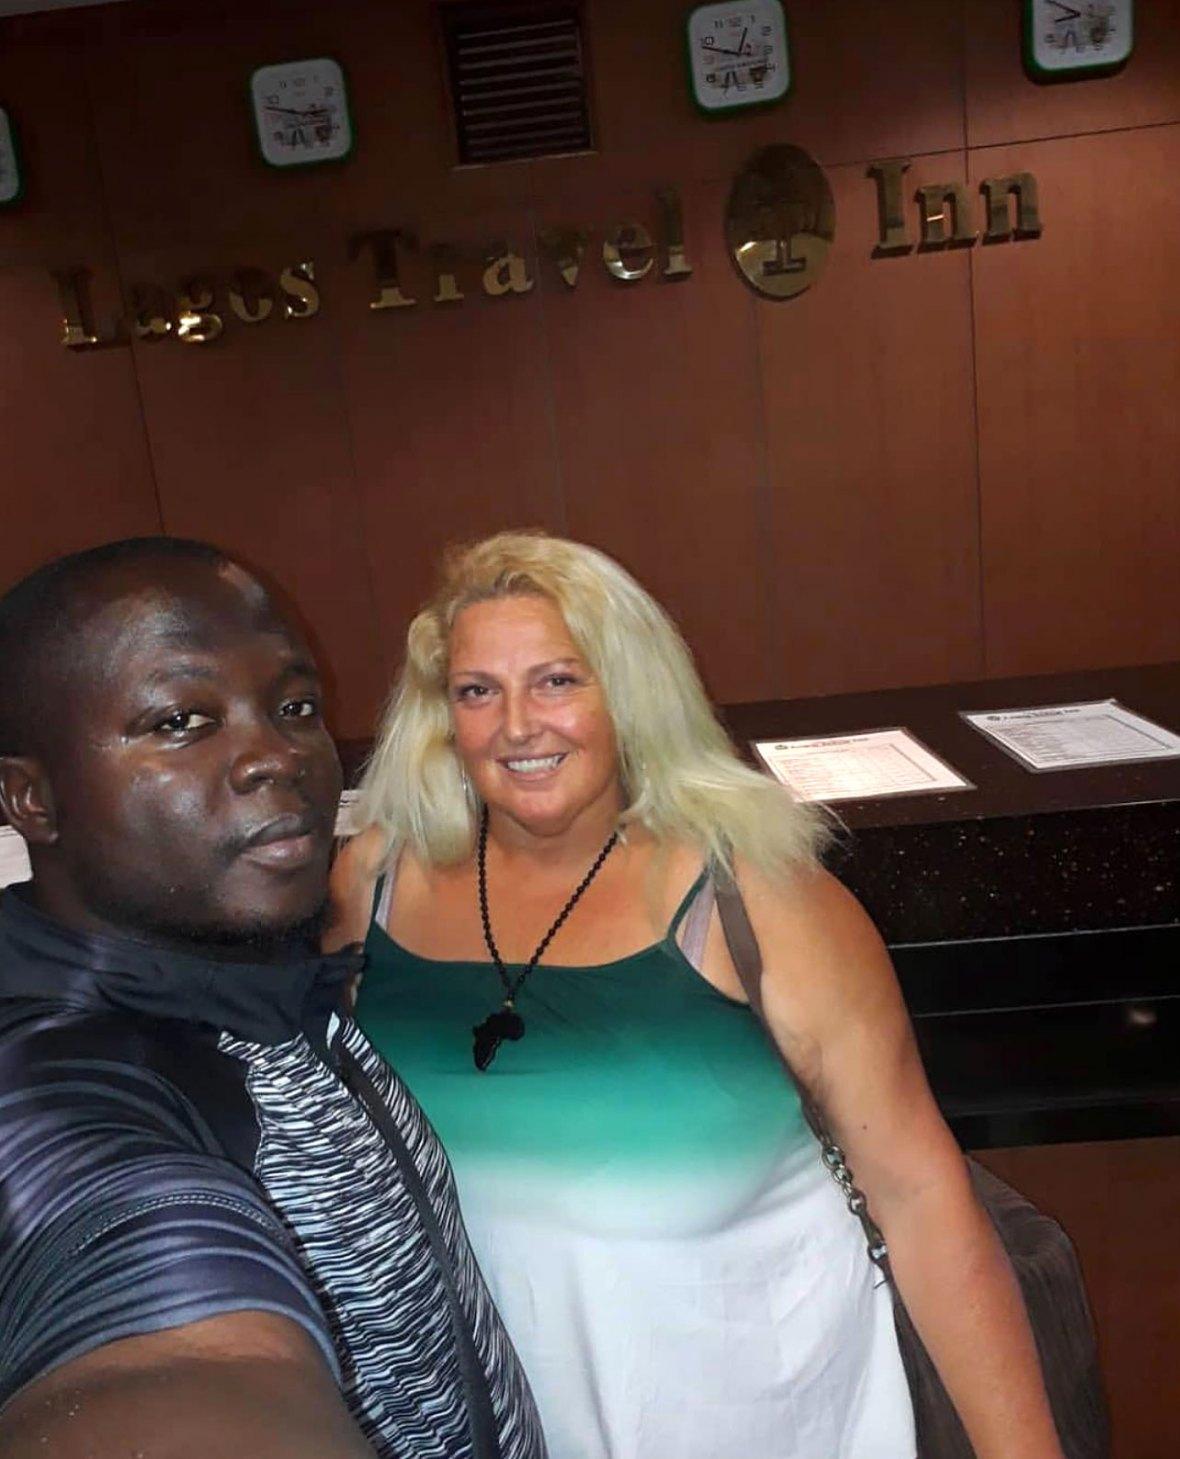 Angela Deem and Michael Ilesanmi Instagram 90 DF